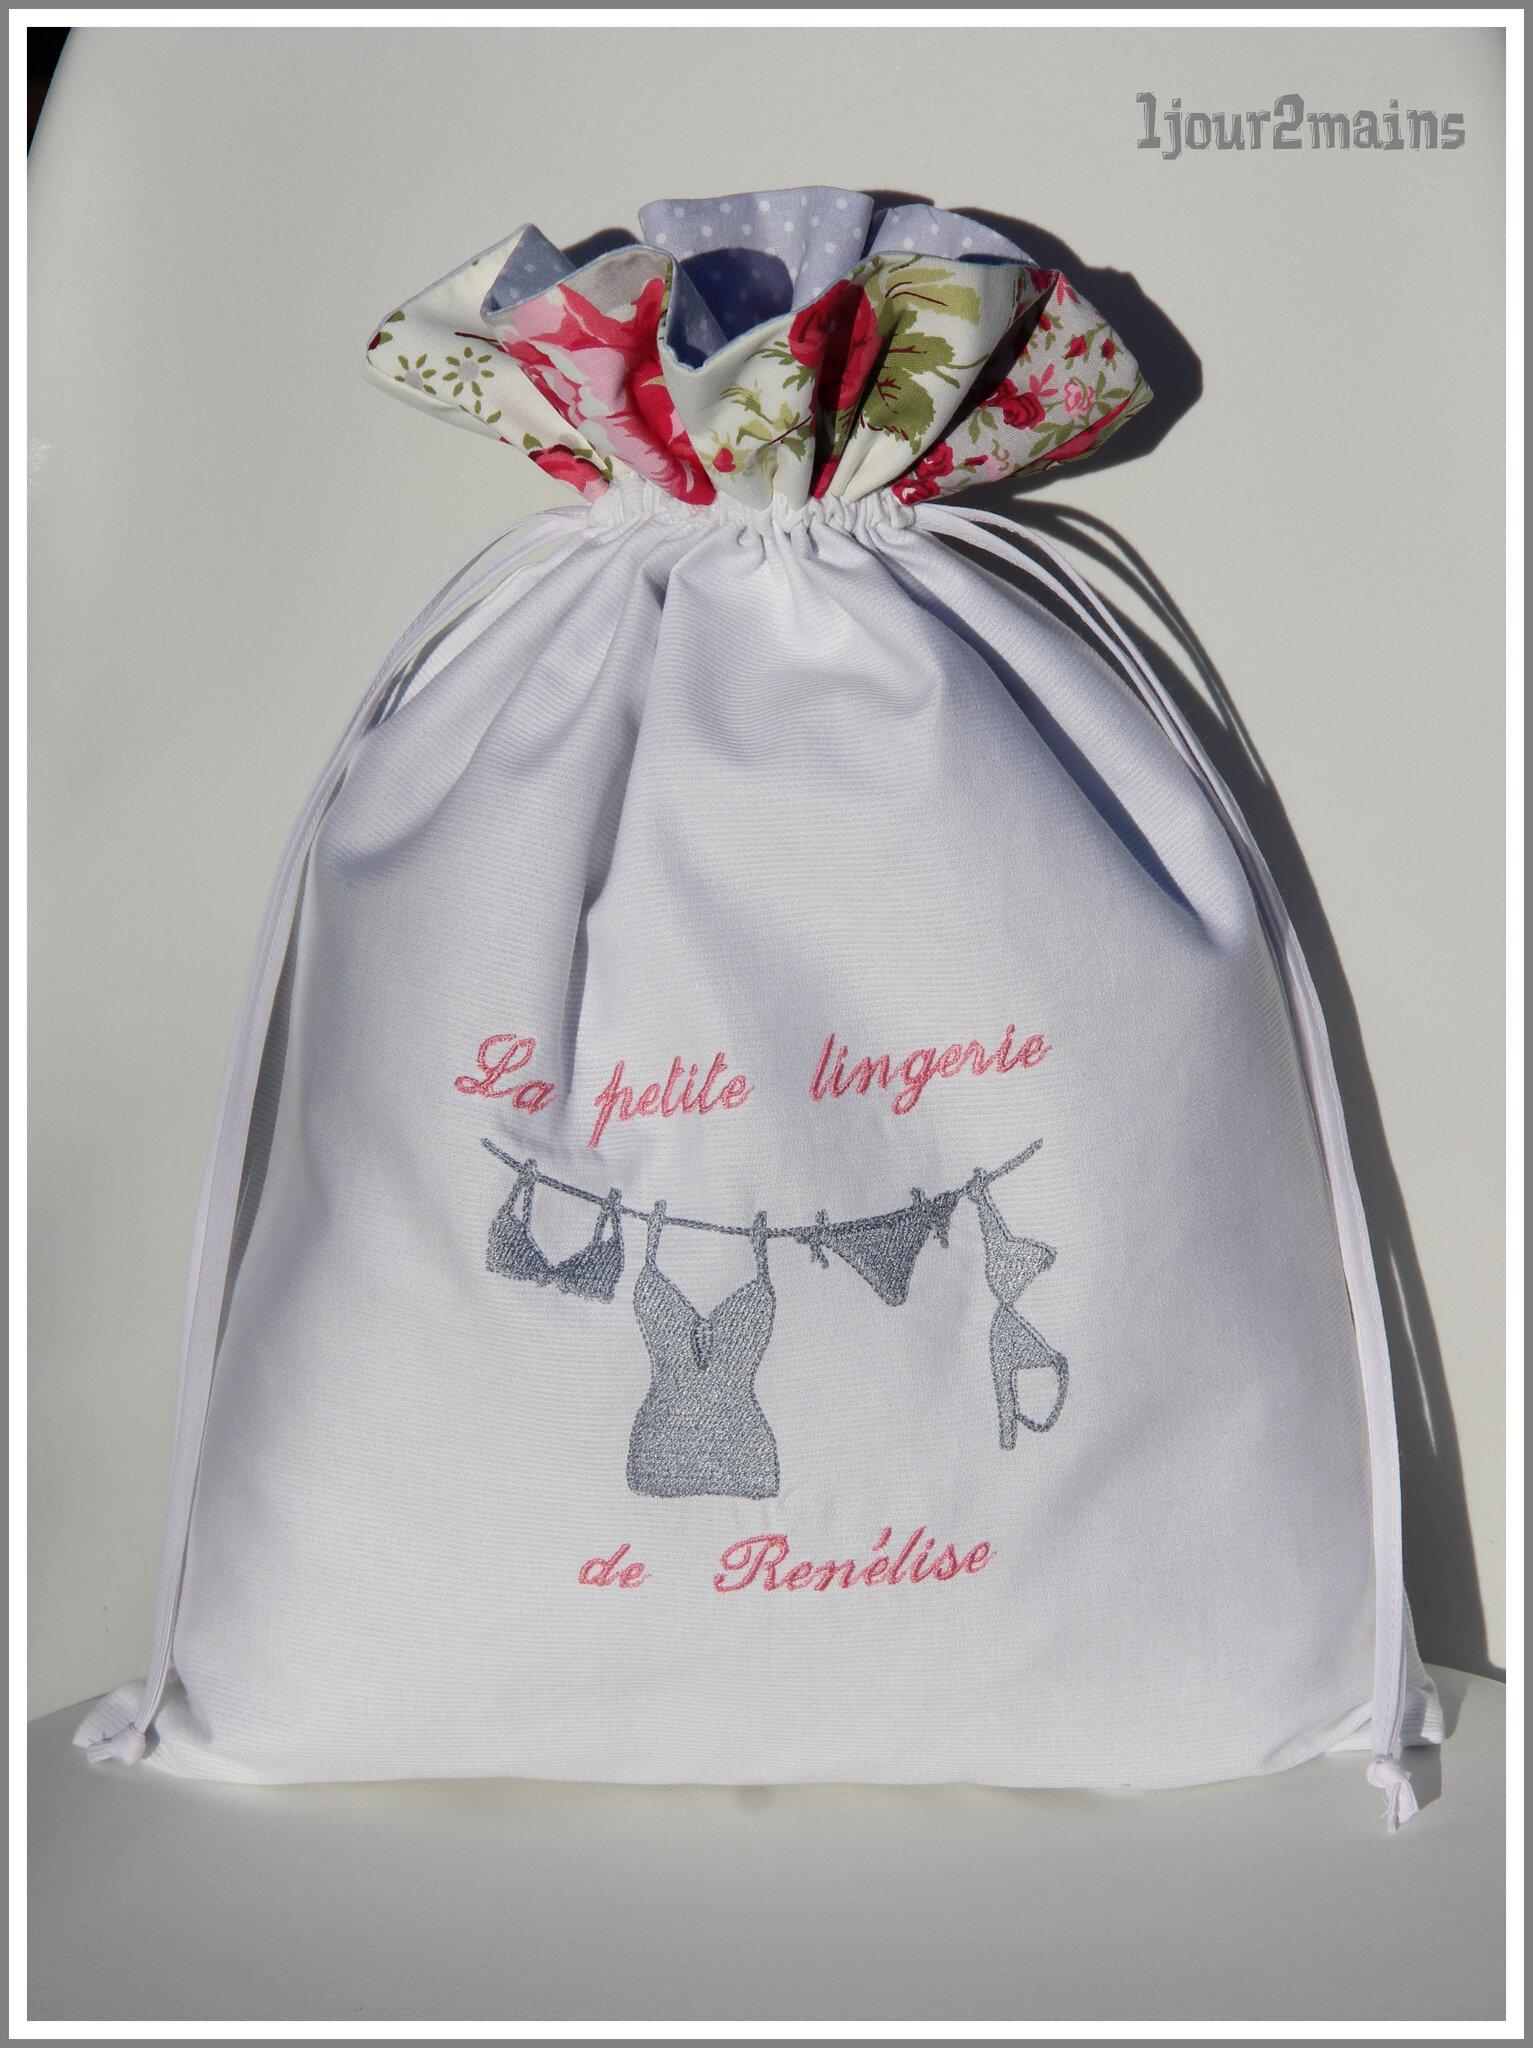 sac lingerie renelise